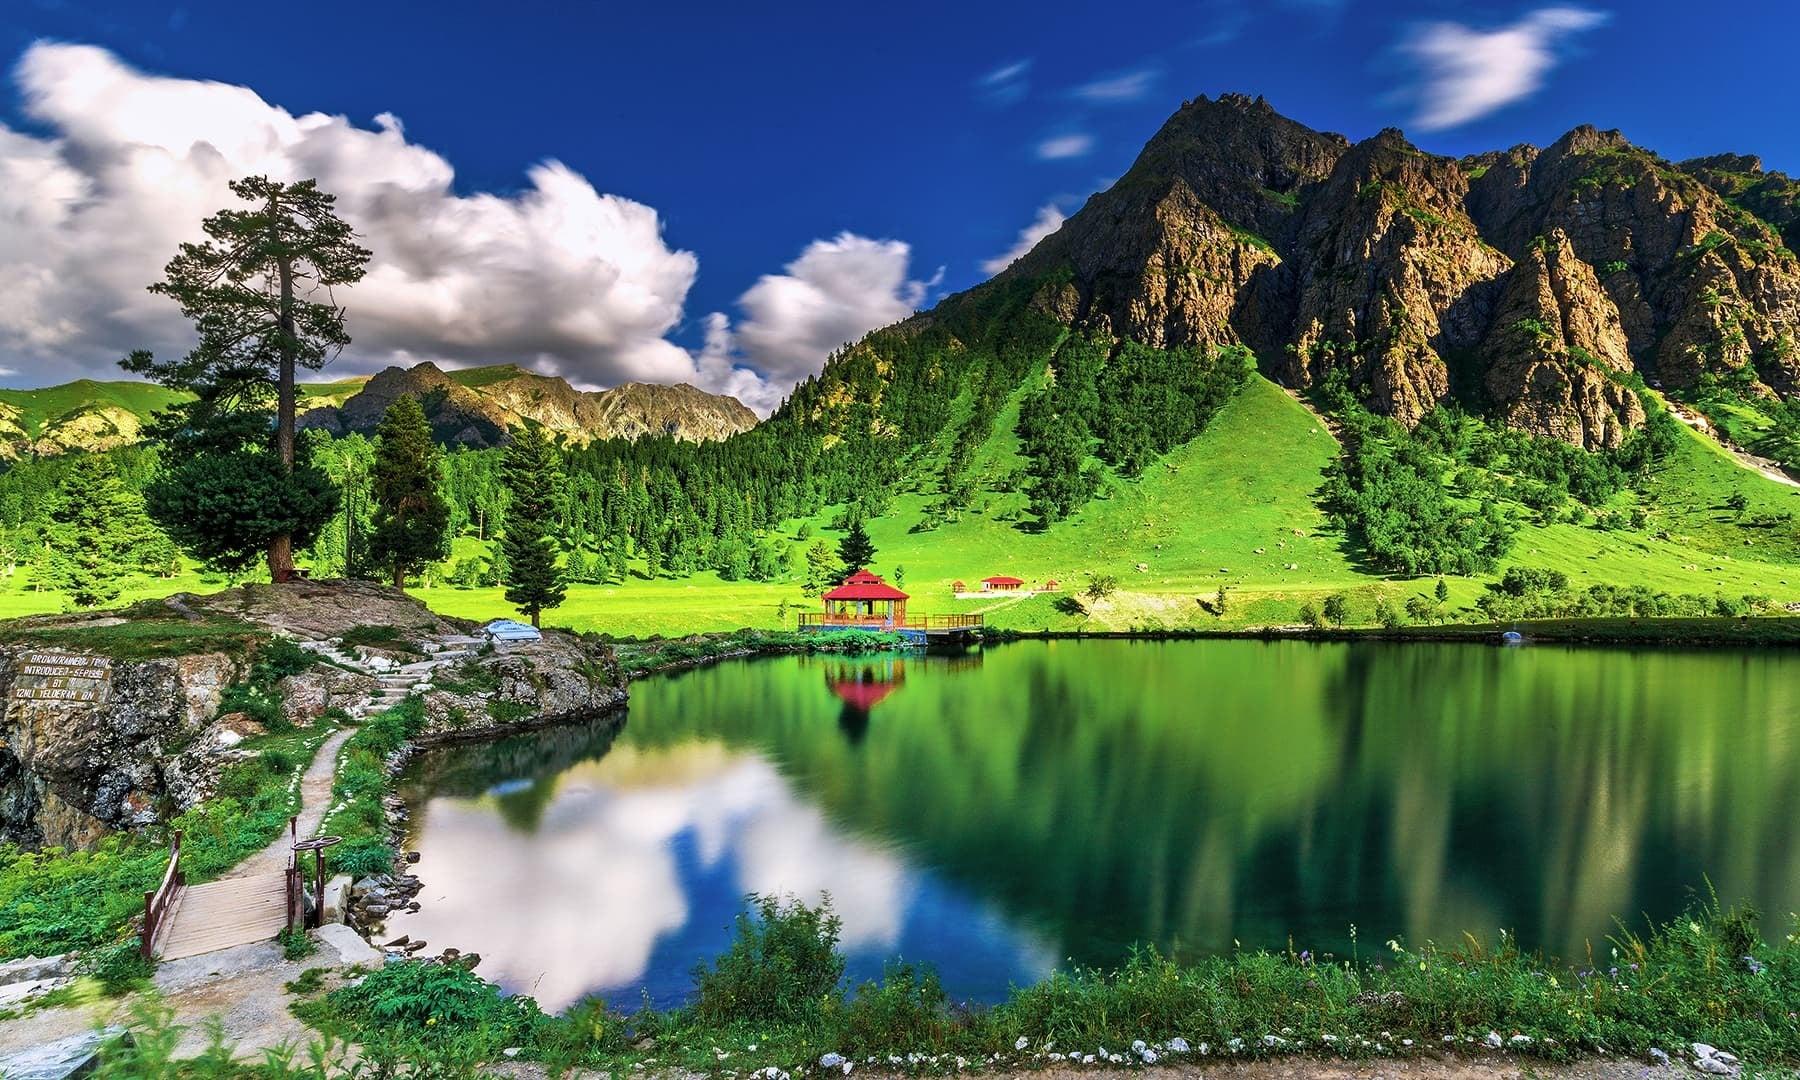 Colours of paradise at Rainbow Lake. — Photo by Syed Mehdi Bukhari